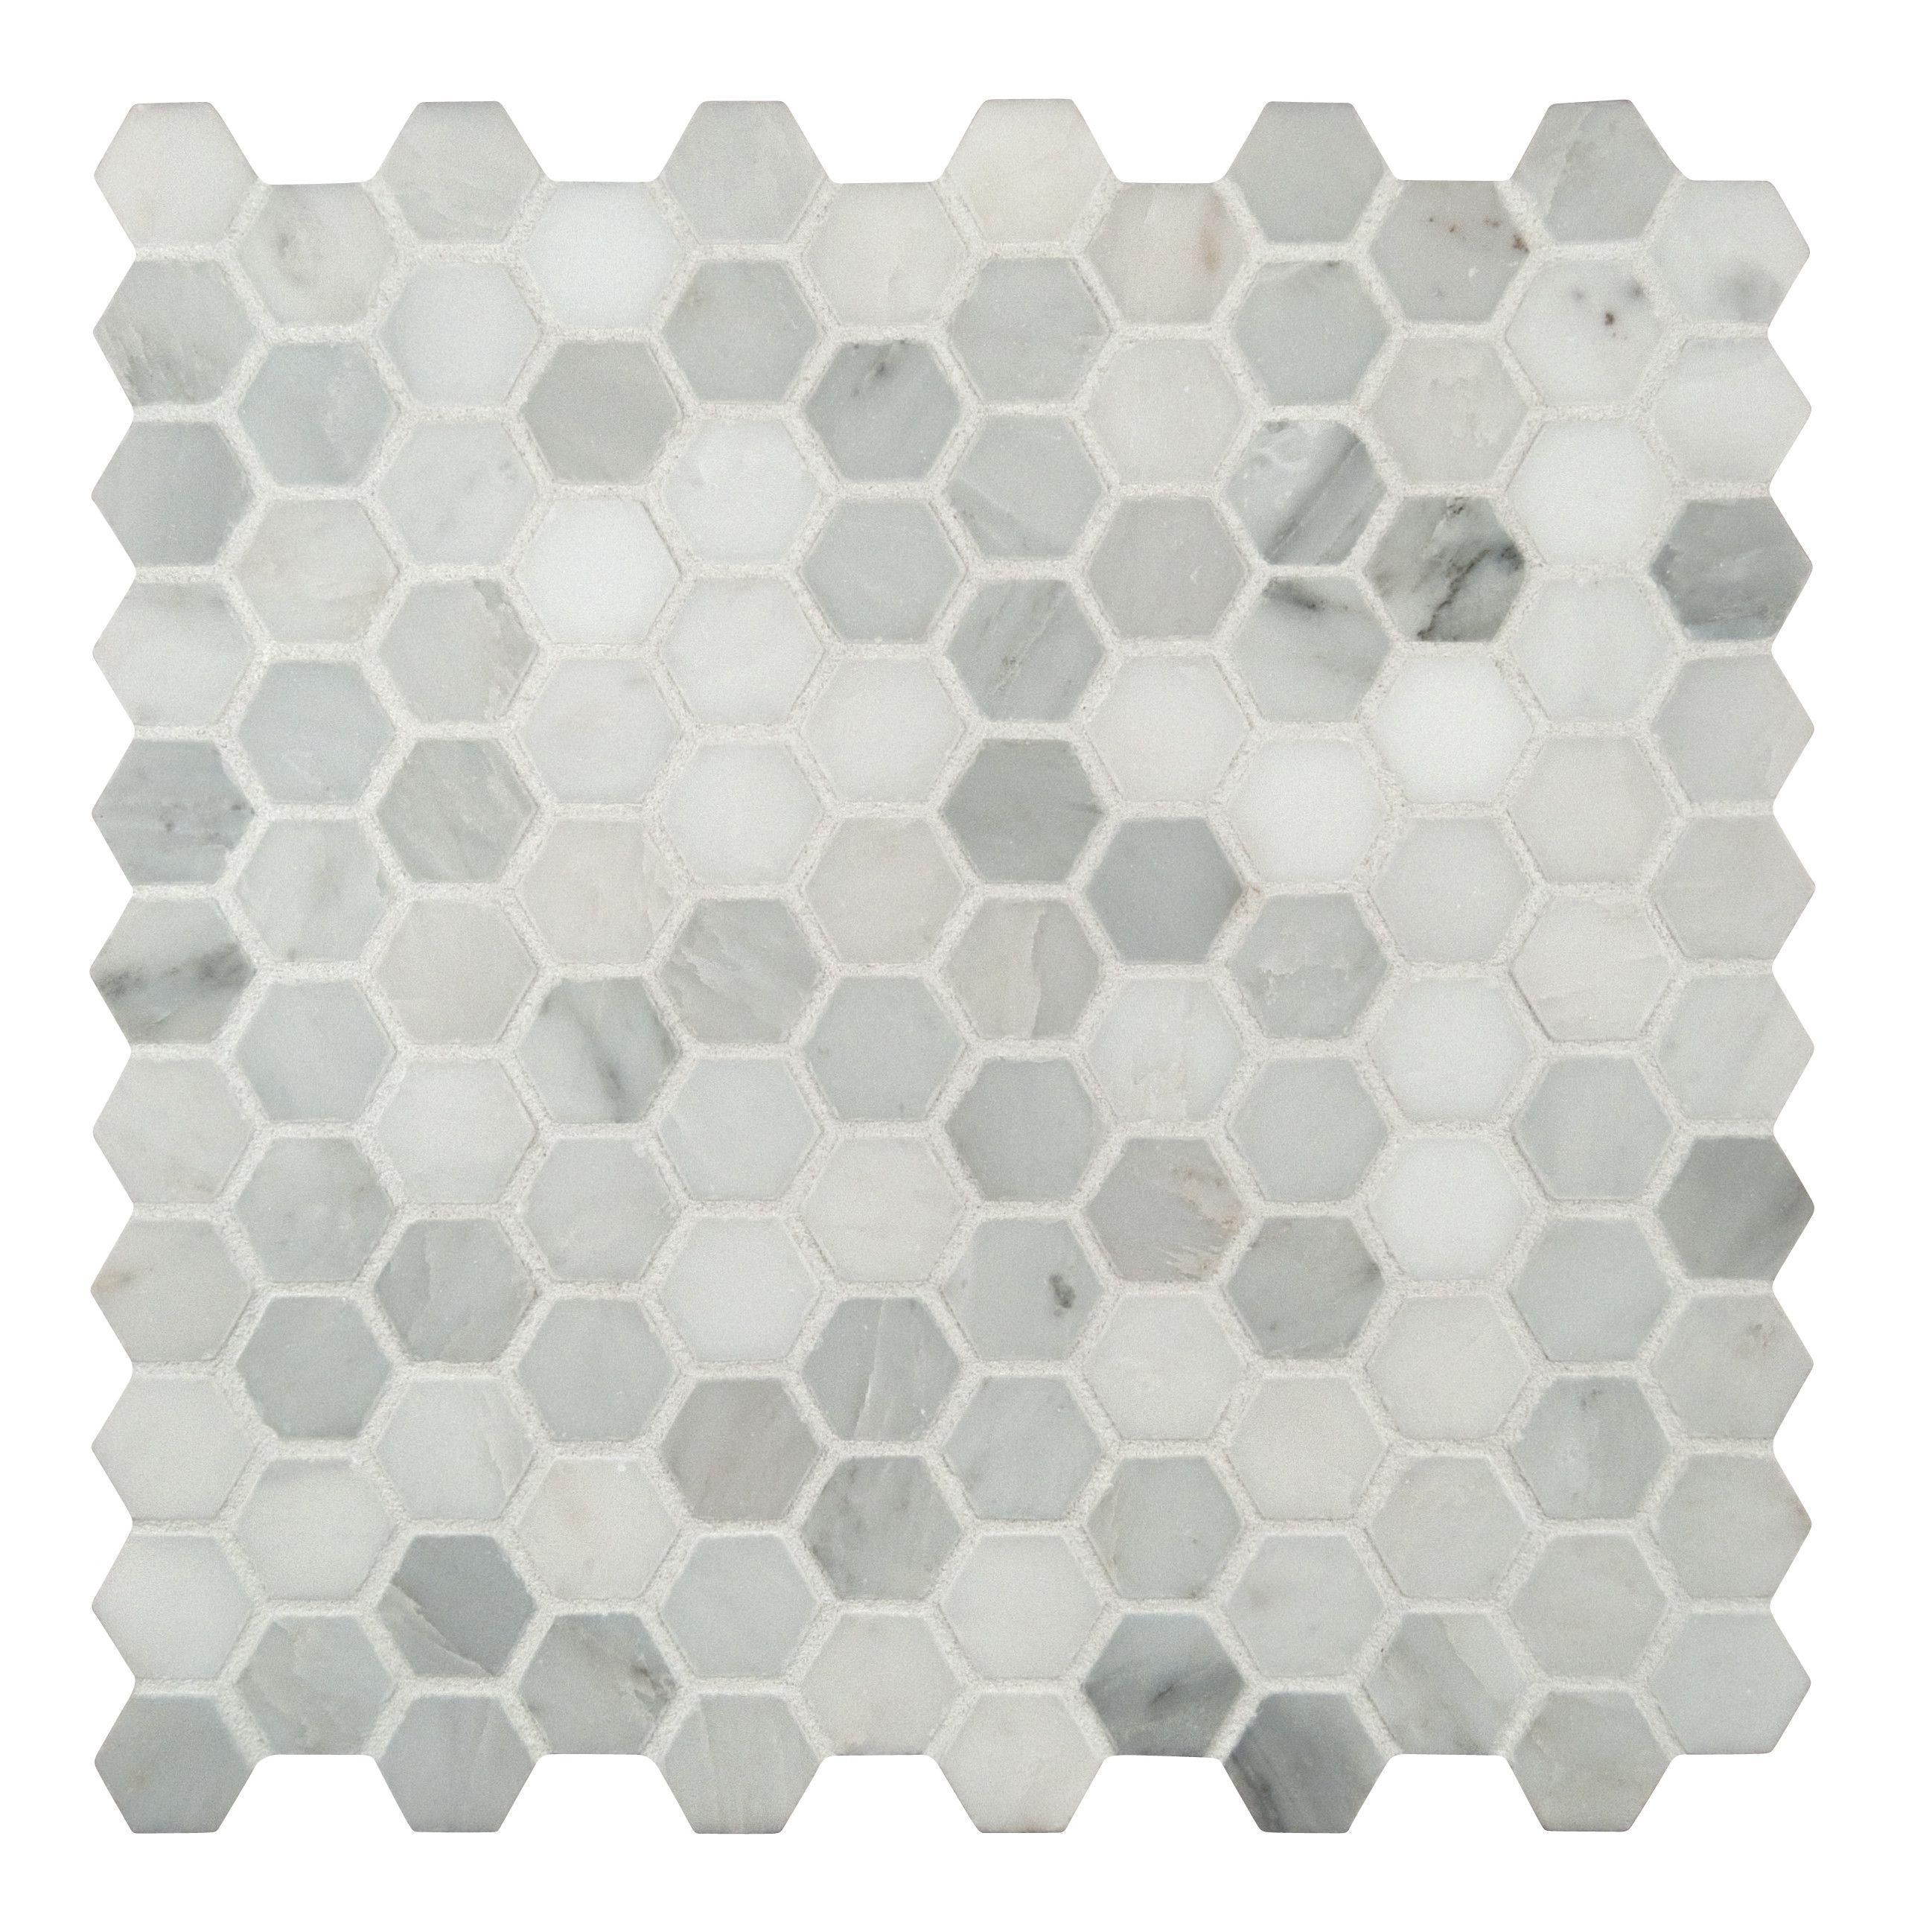 Arabescato carrara 12 x 12 marble tile in white marble mosaic arabescato carrara 12 x 12 marble tile in white dailygadgetfo Gallery